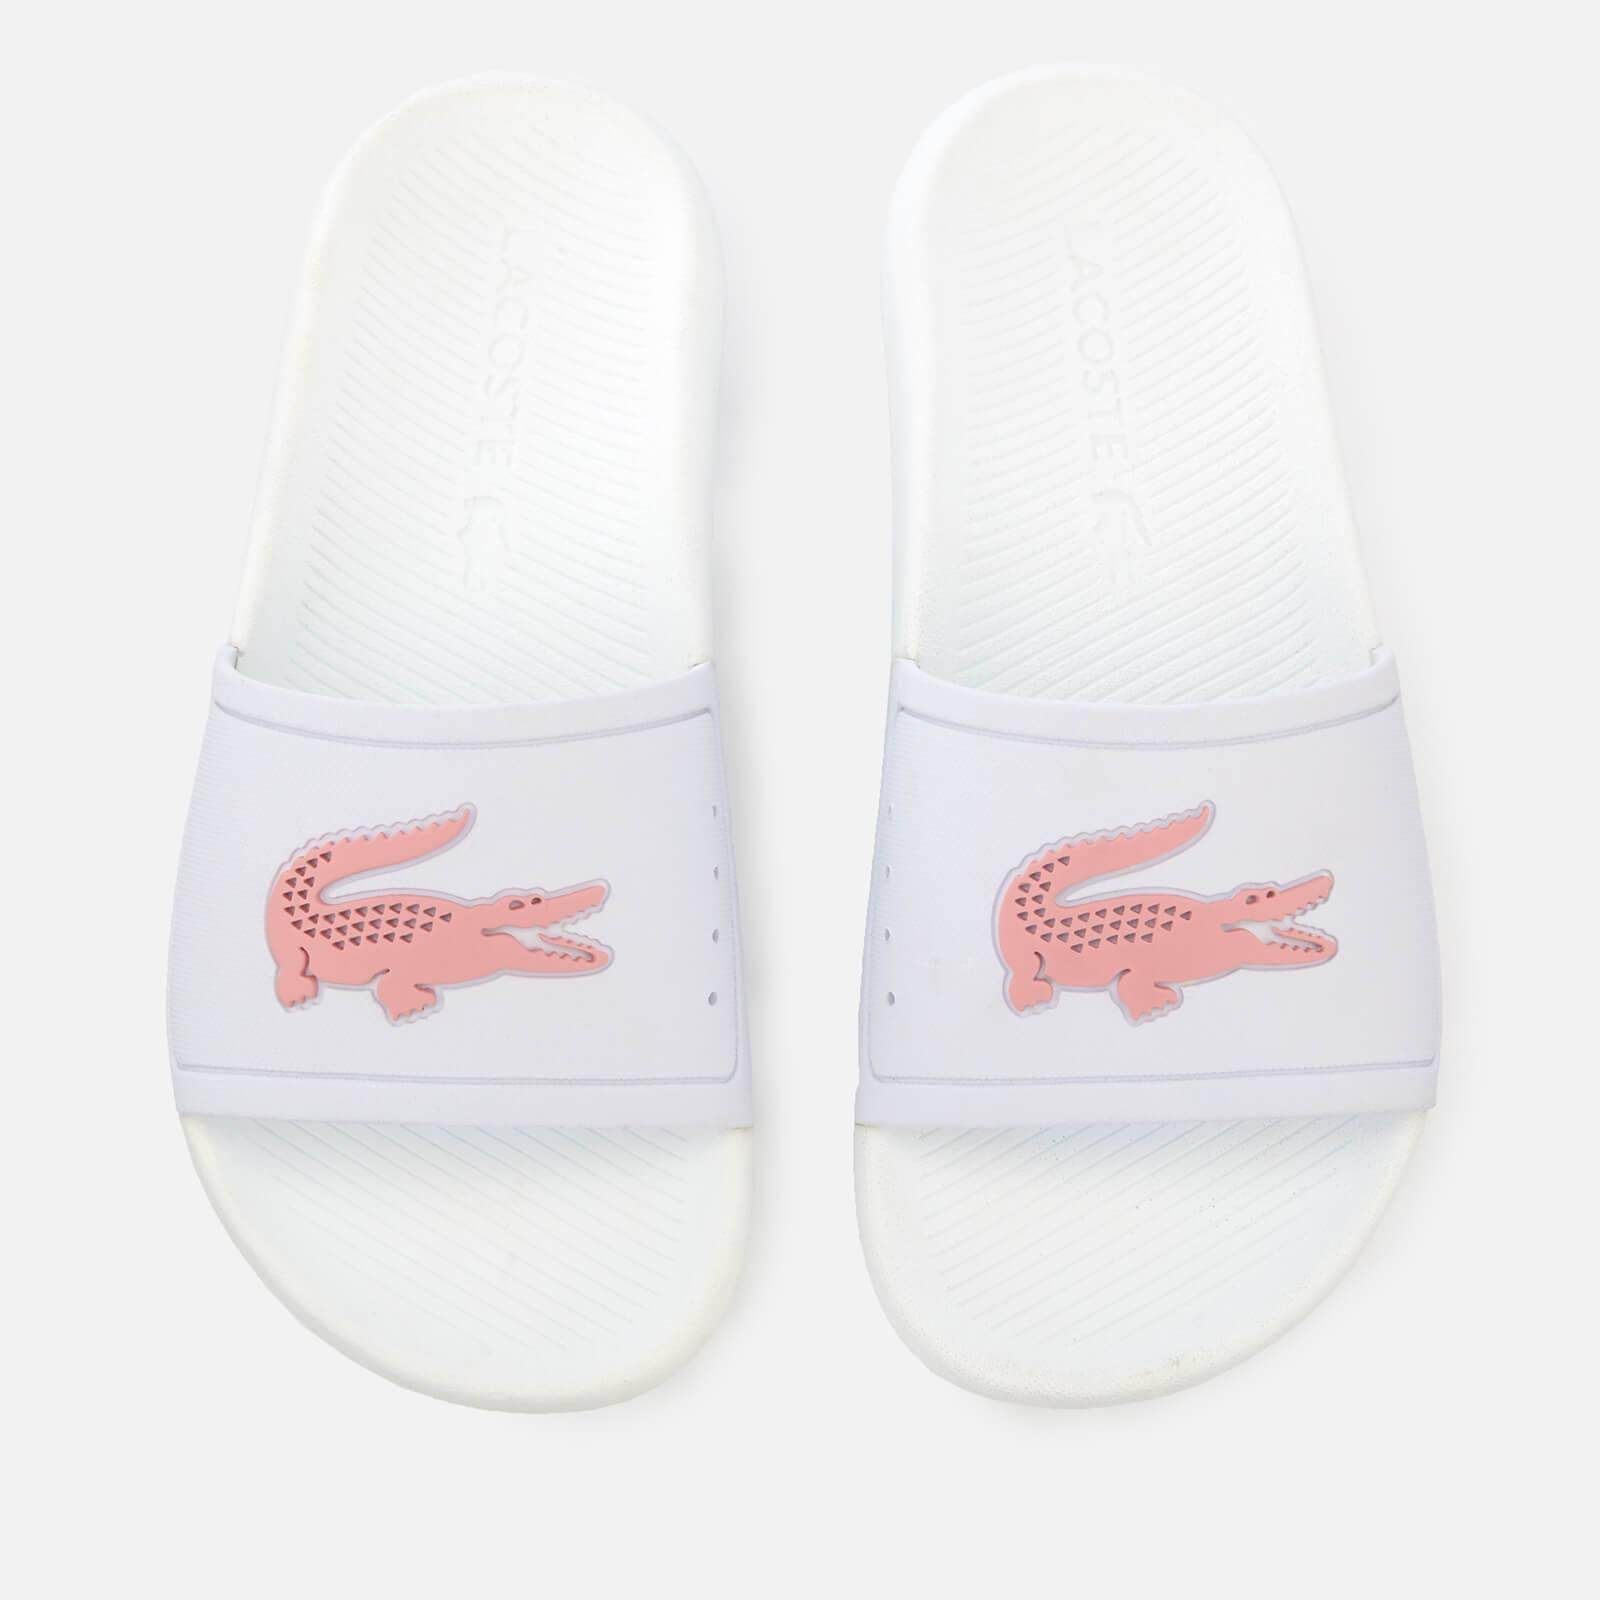 Lacoste Women's Croco Slide 119 3 Sandals - White/Light Pink - UK 5 - White/Pink